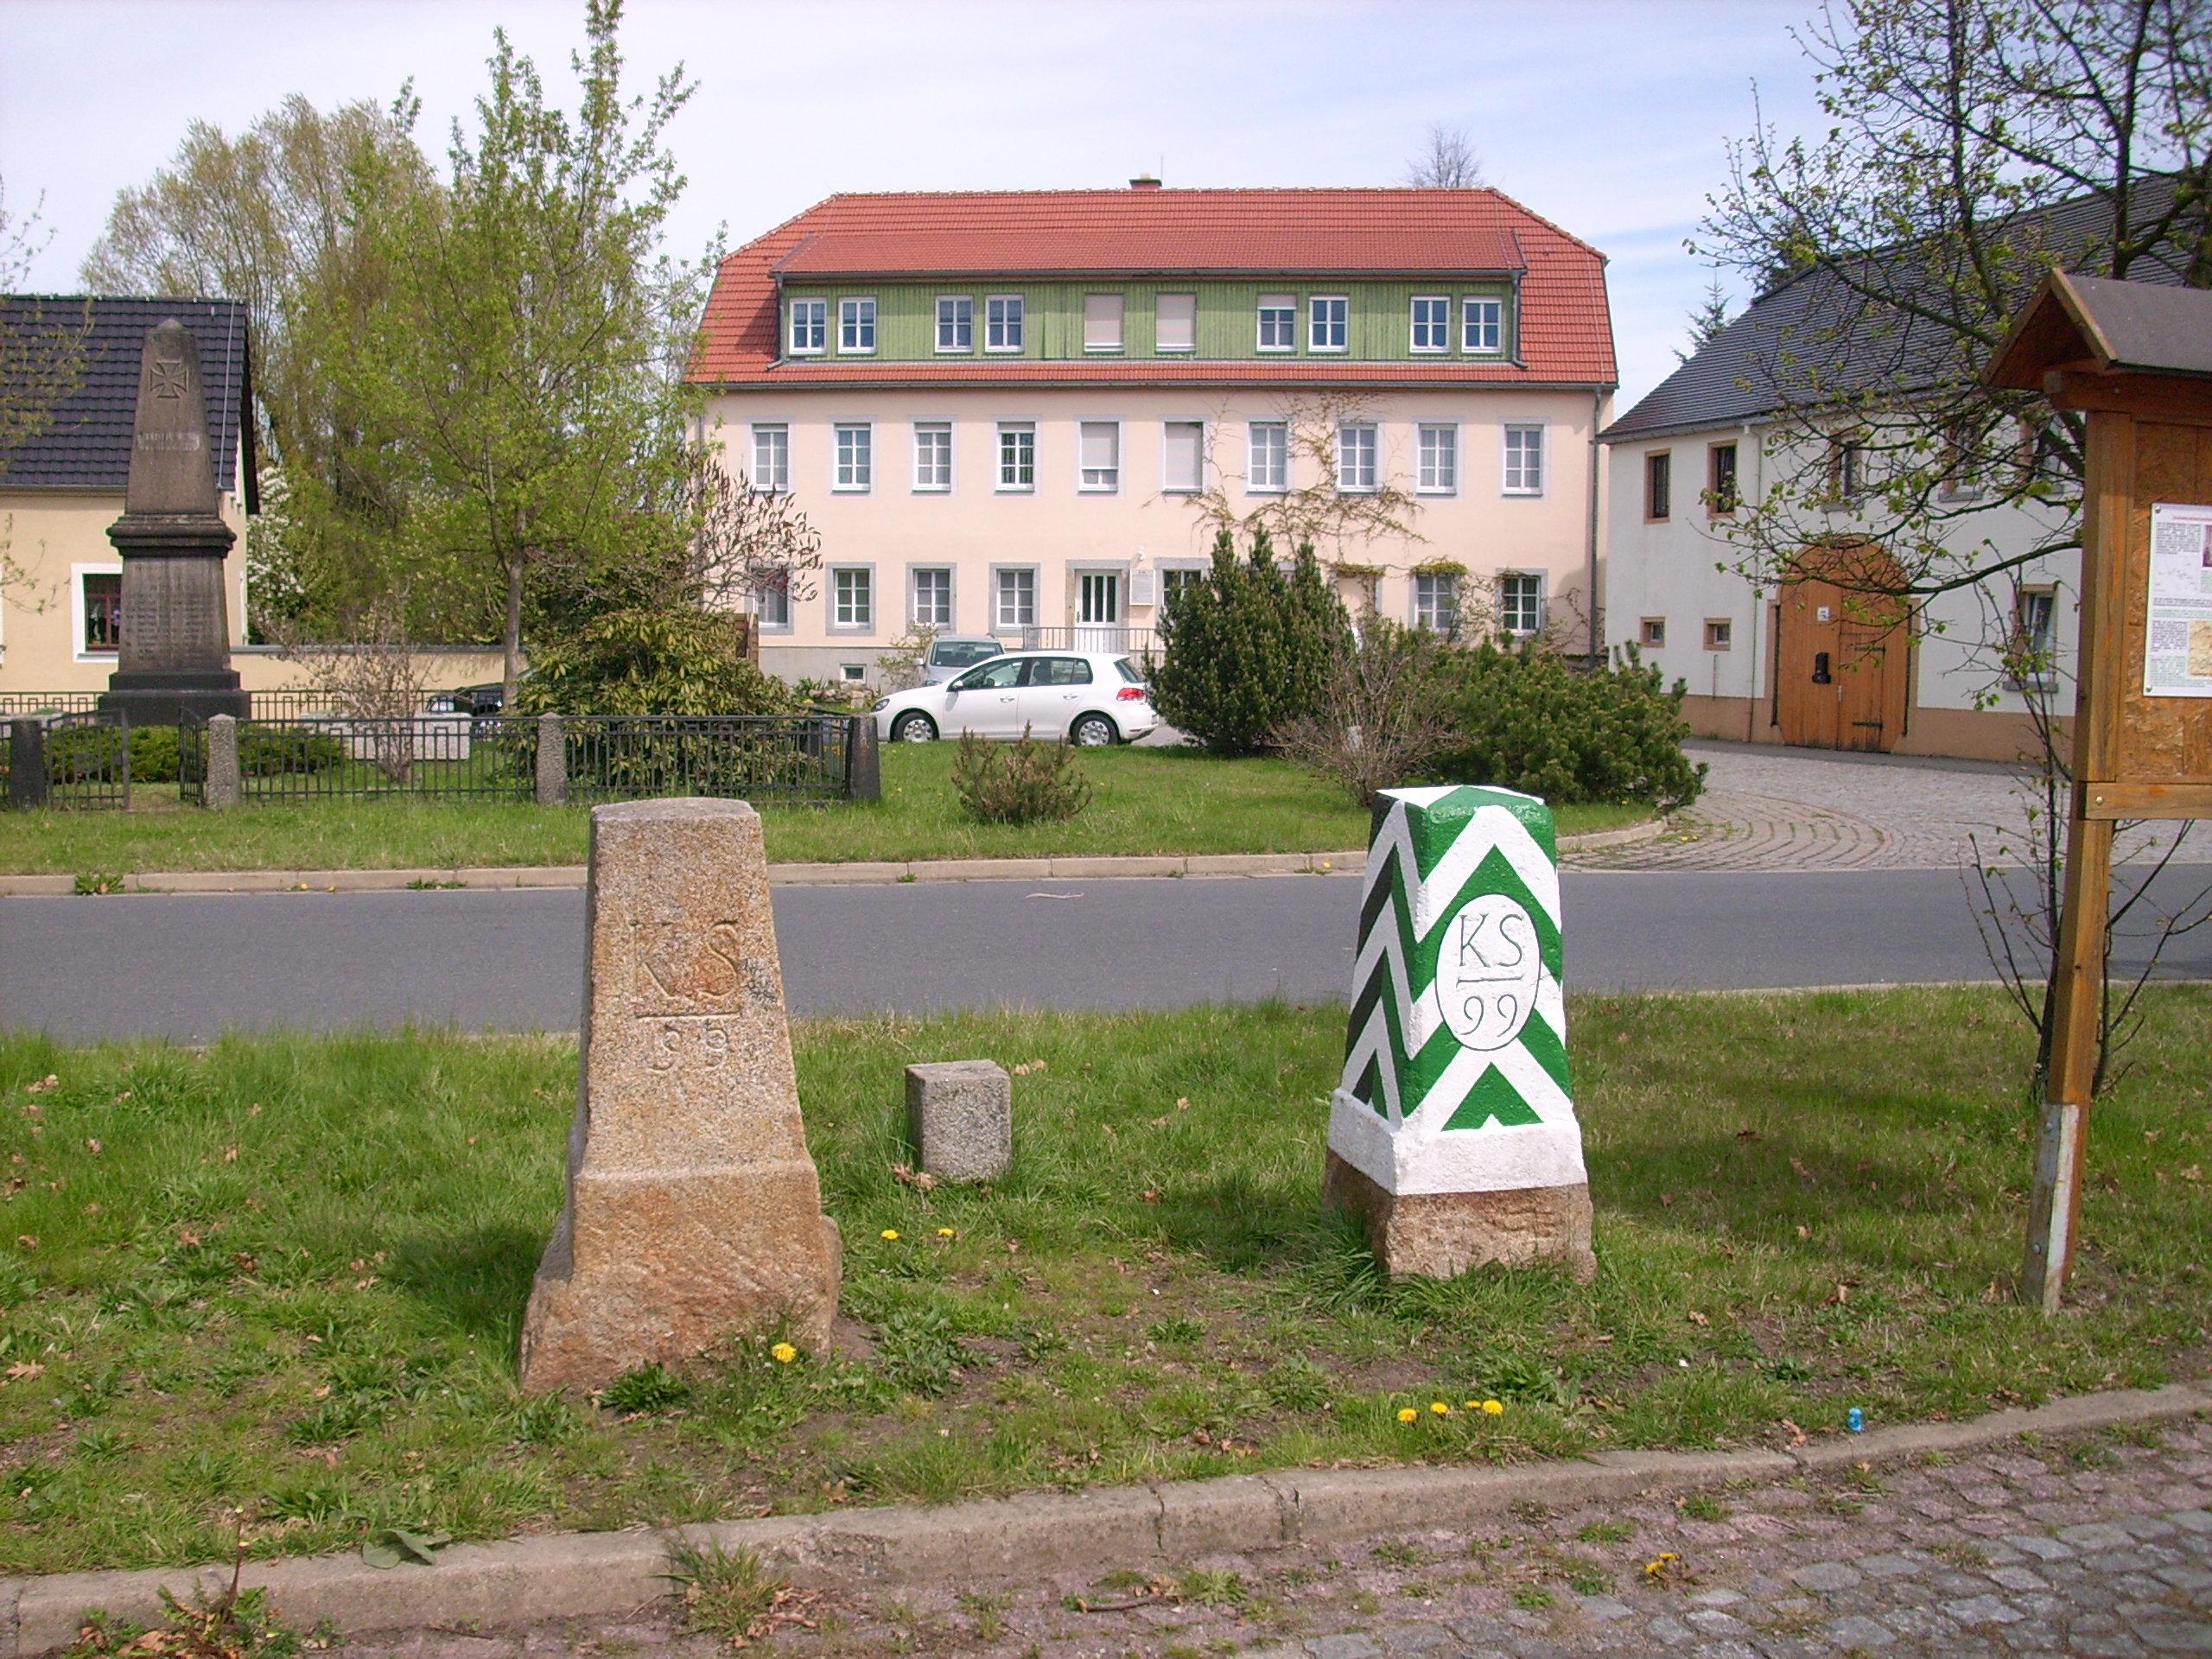 Königswartha vald